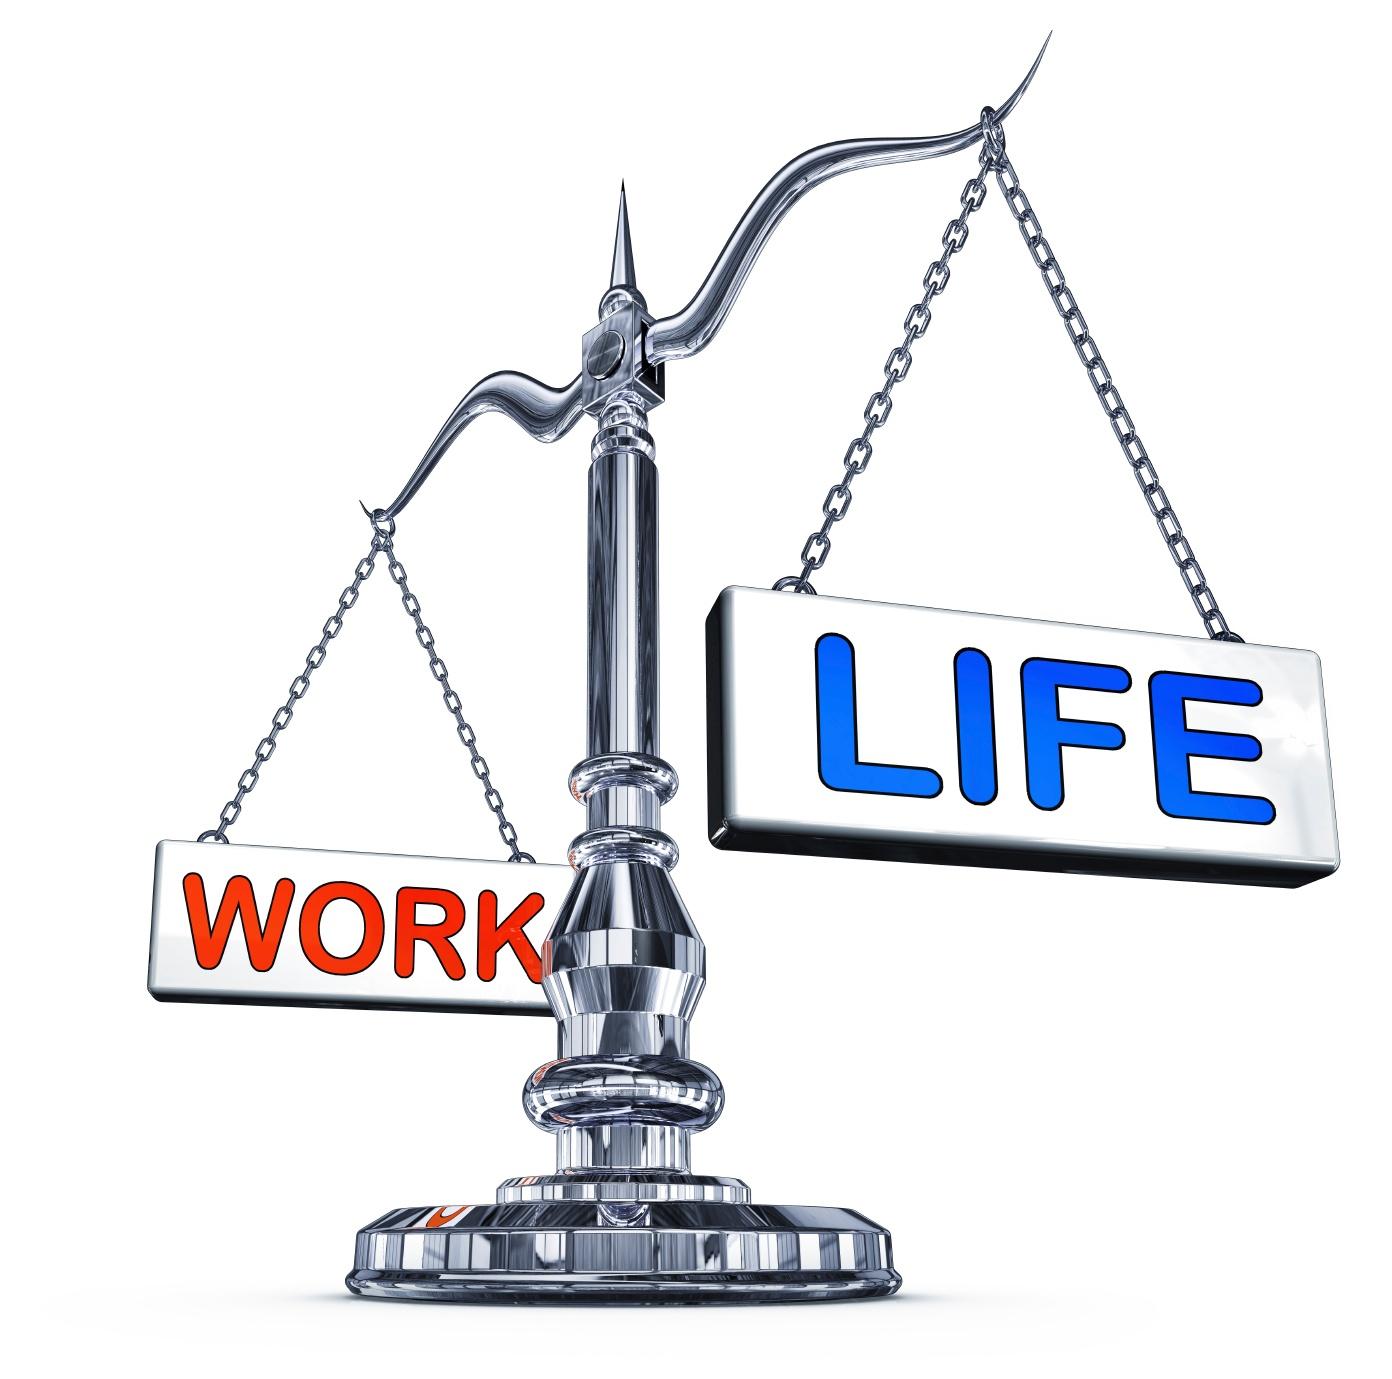 Work-life_balance.jpg